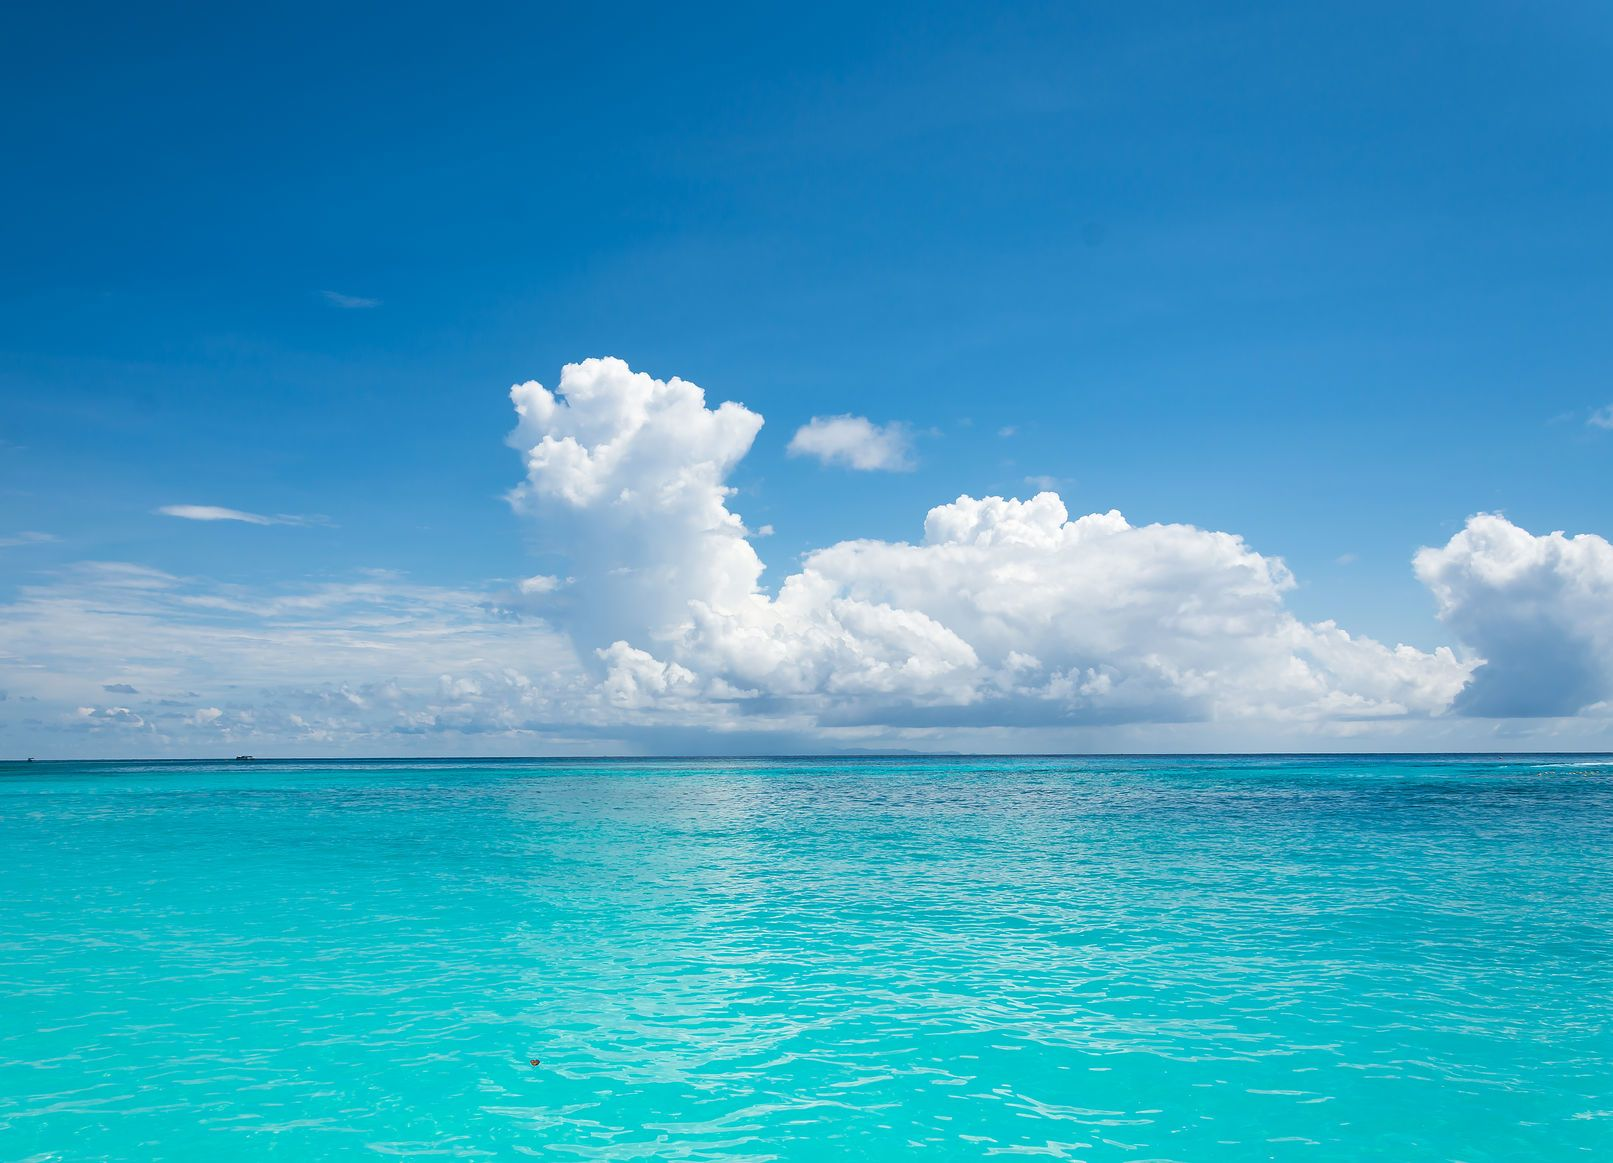 Modrá obloha a oceán   topntp/123RF.com